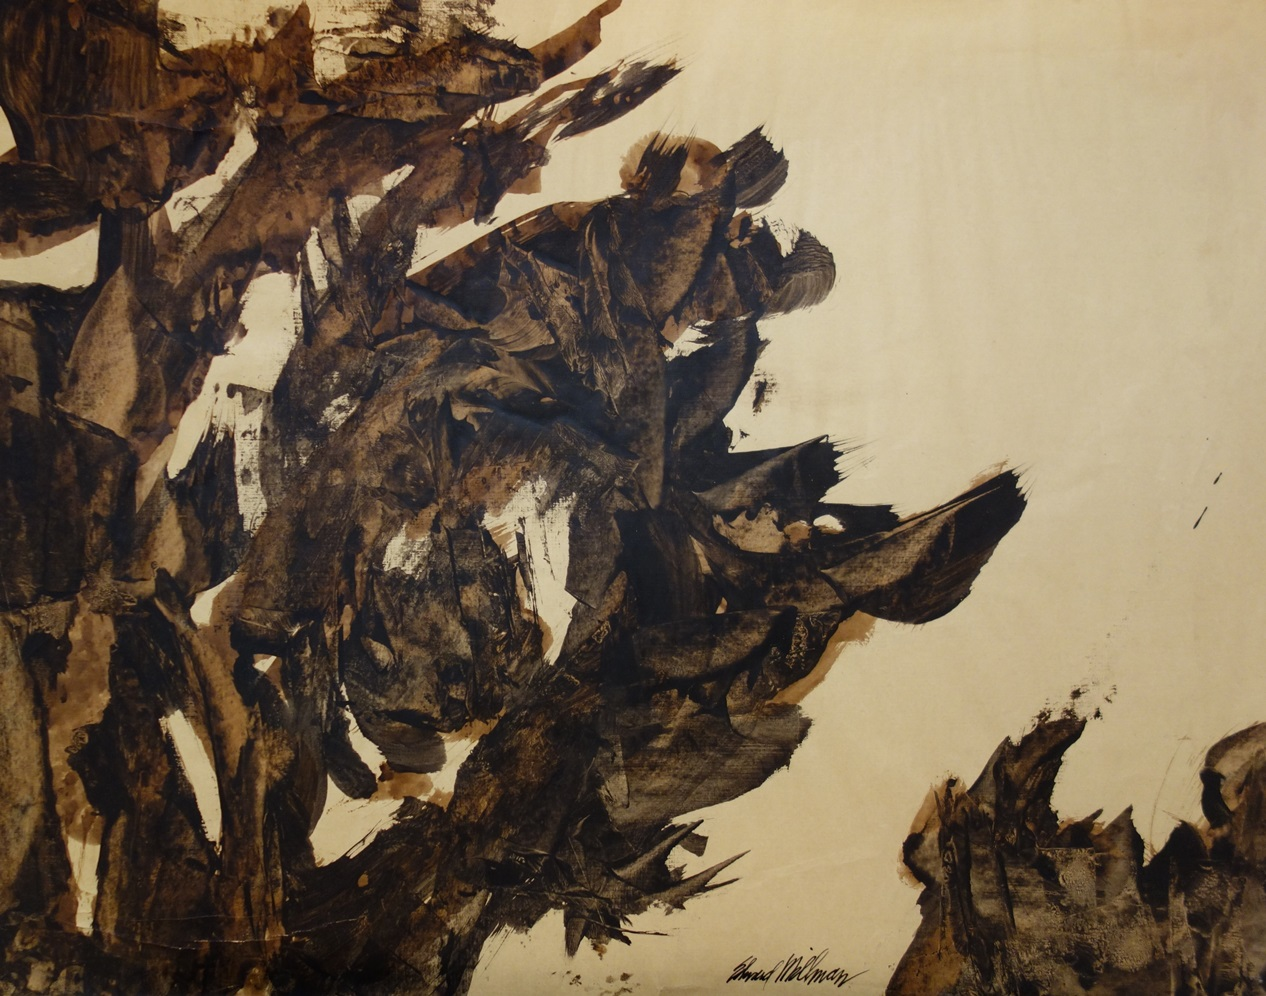 edward millman artist